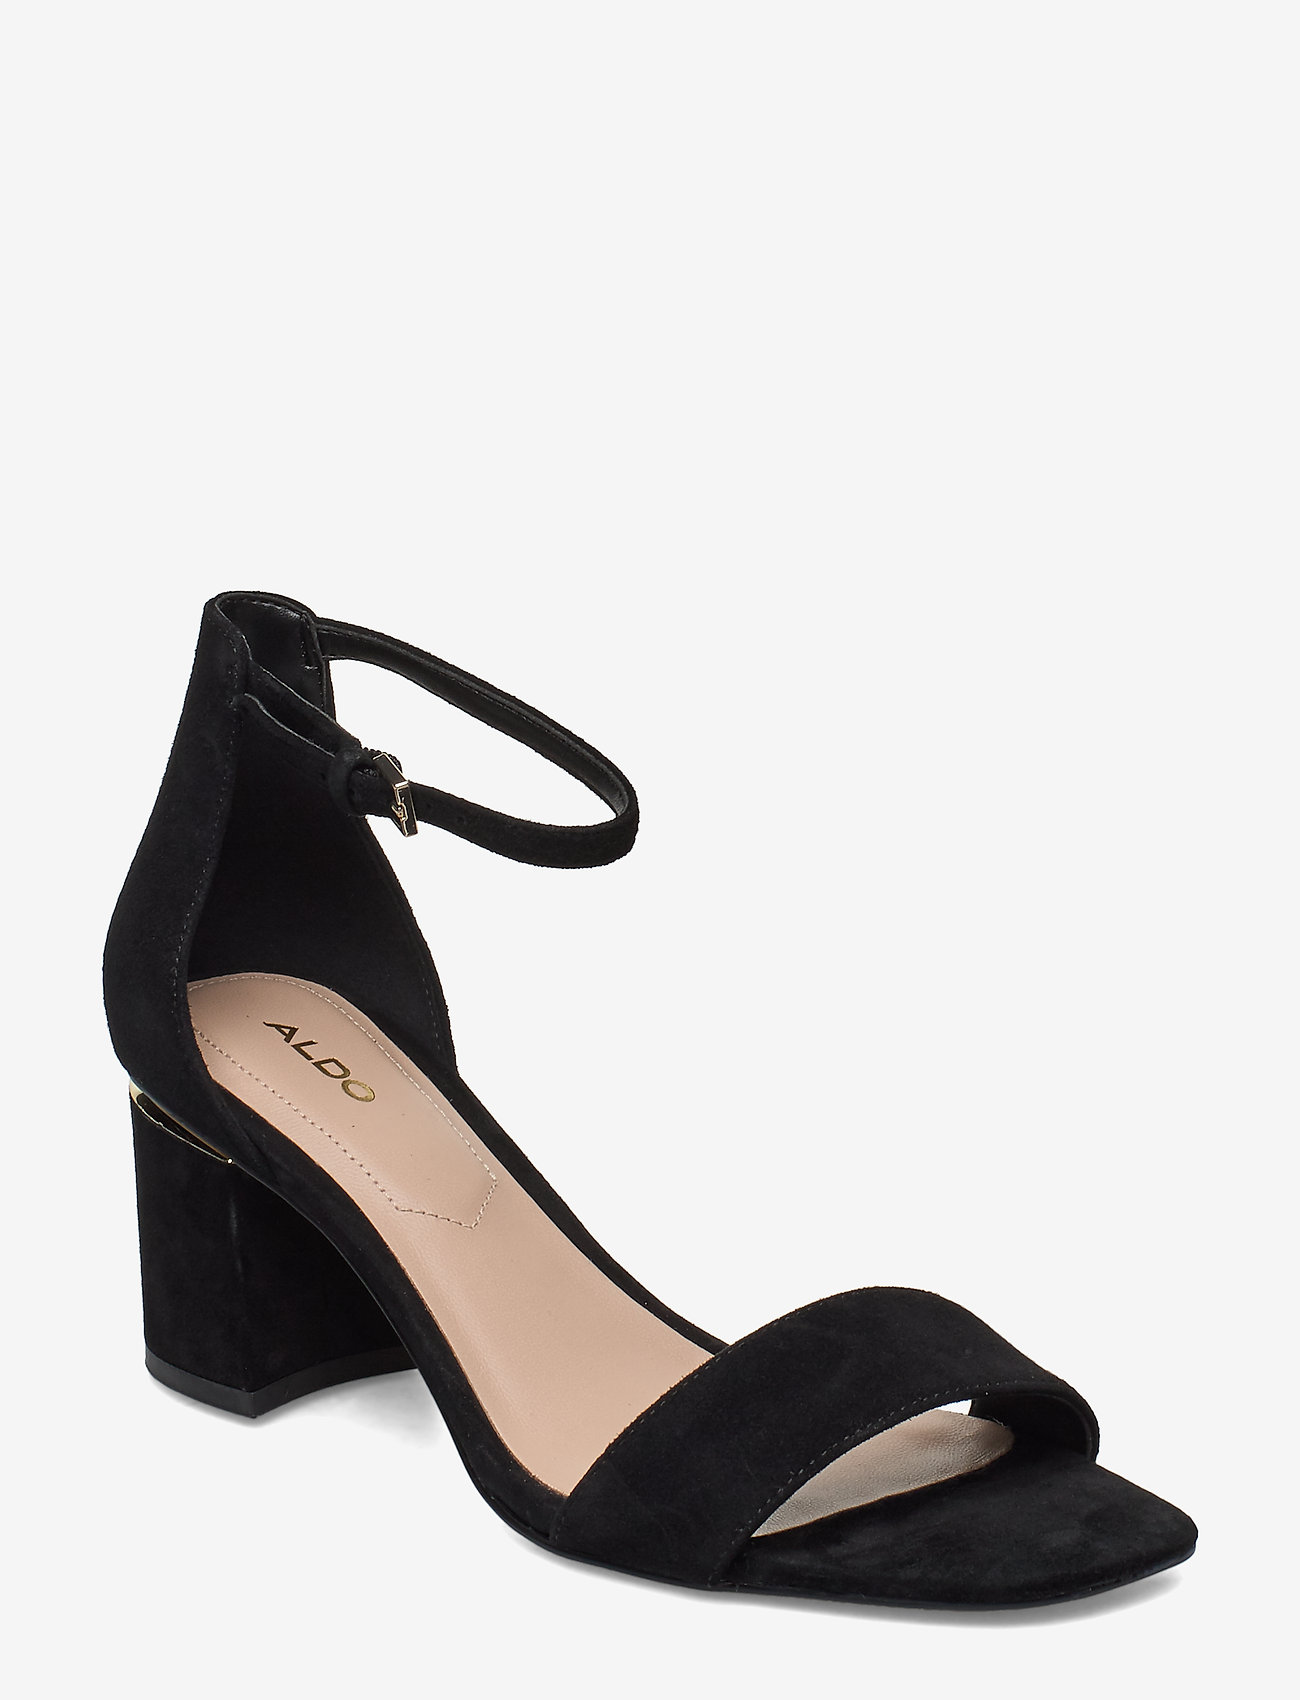 Aldo - VALENTINA - høyhælte sandaler - black